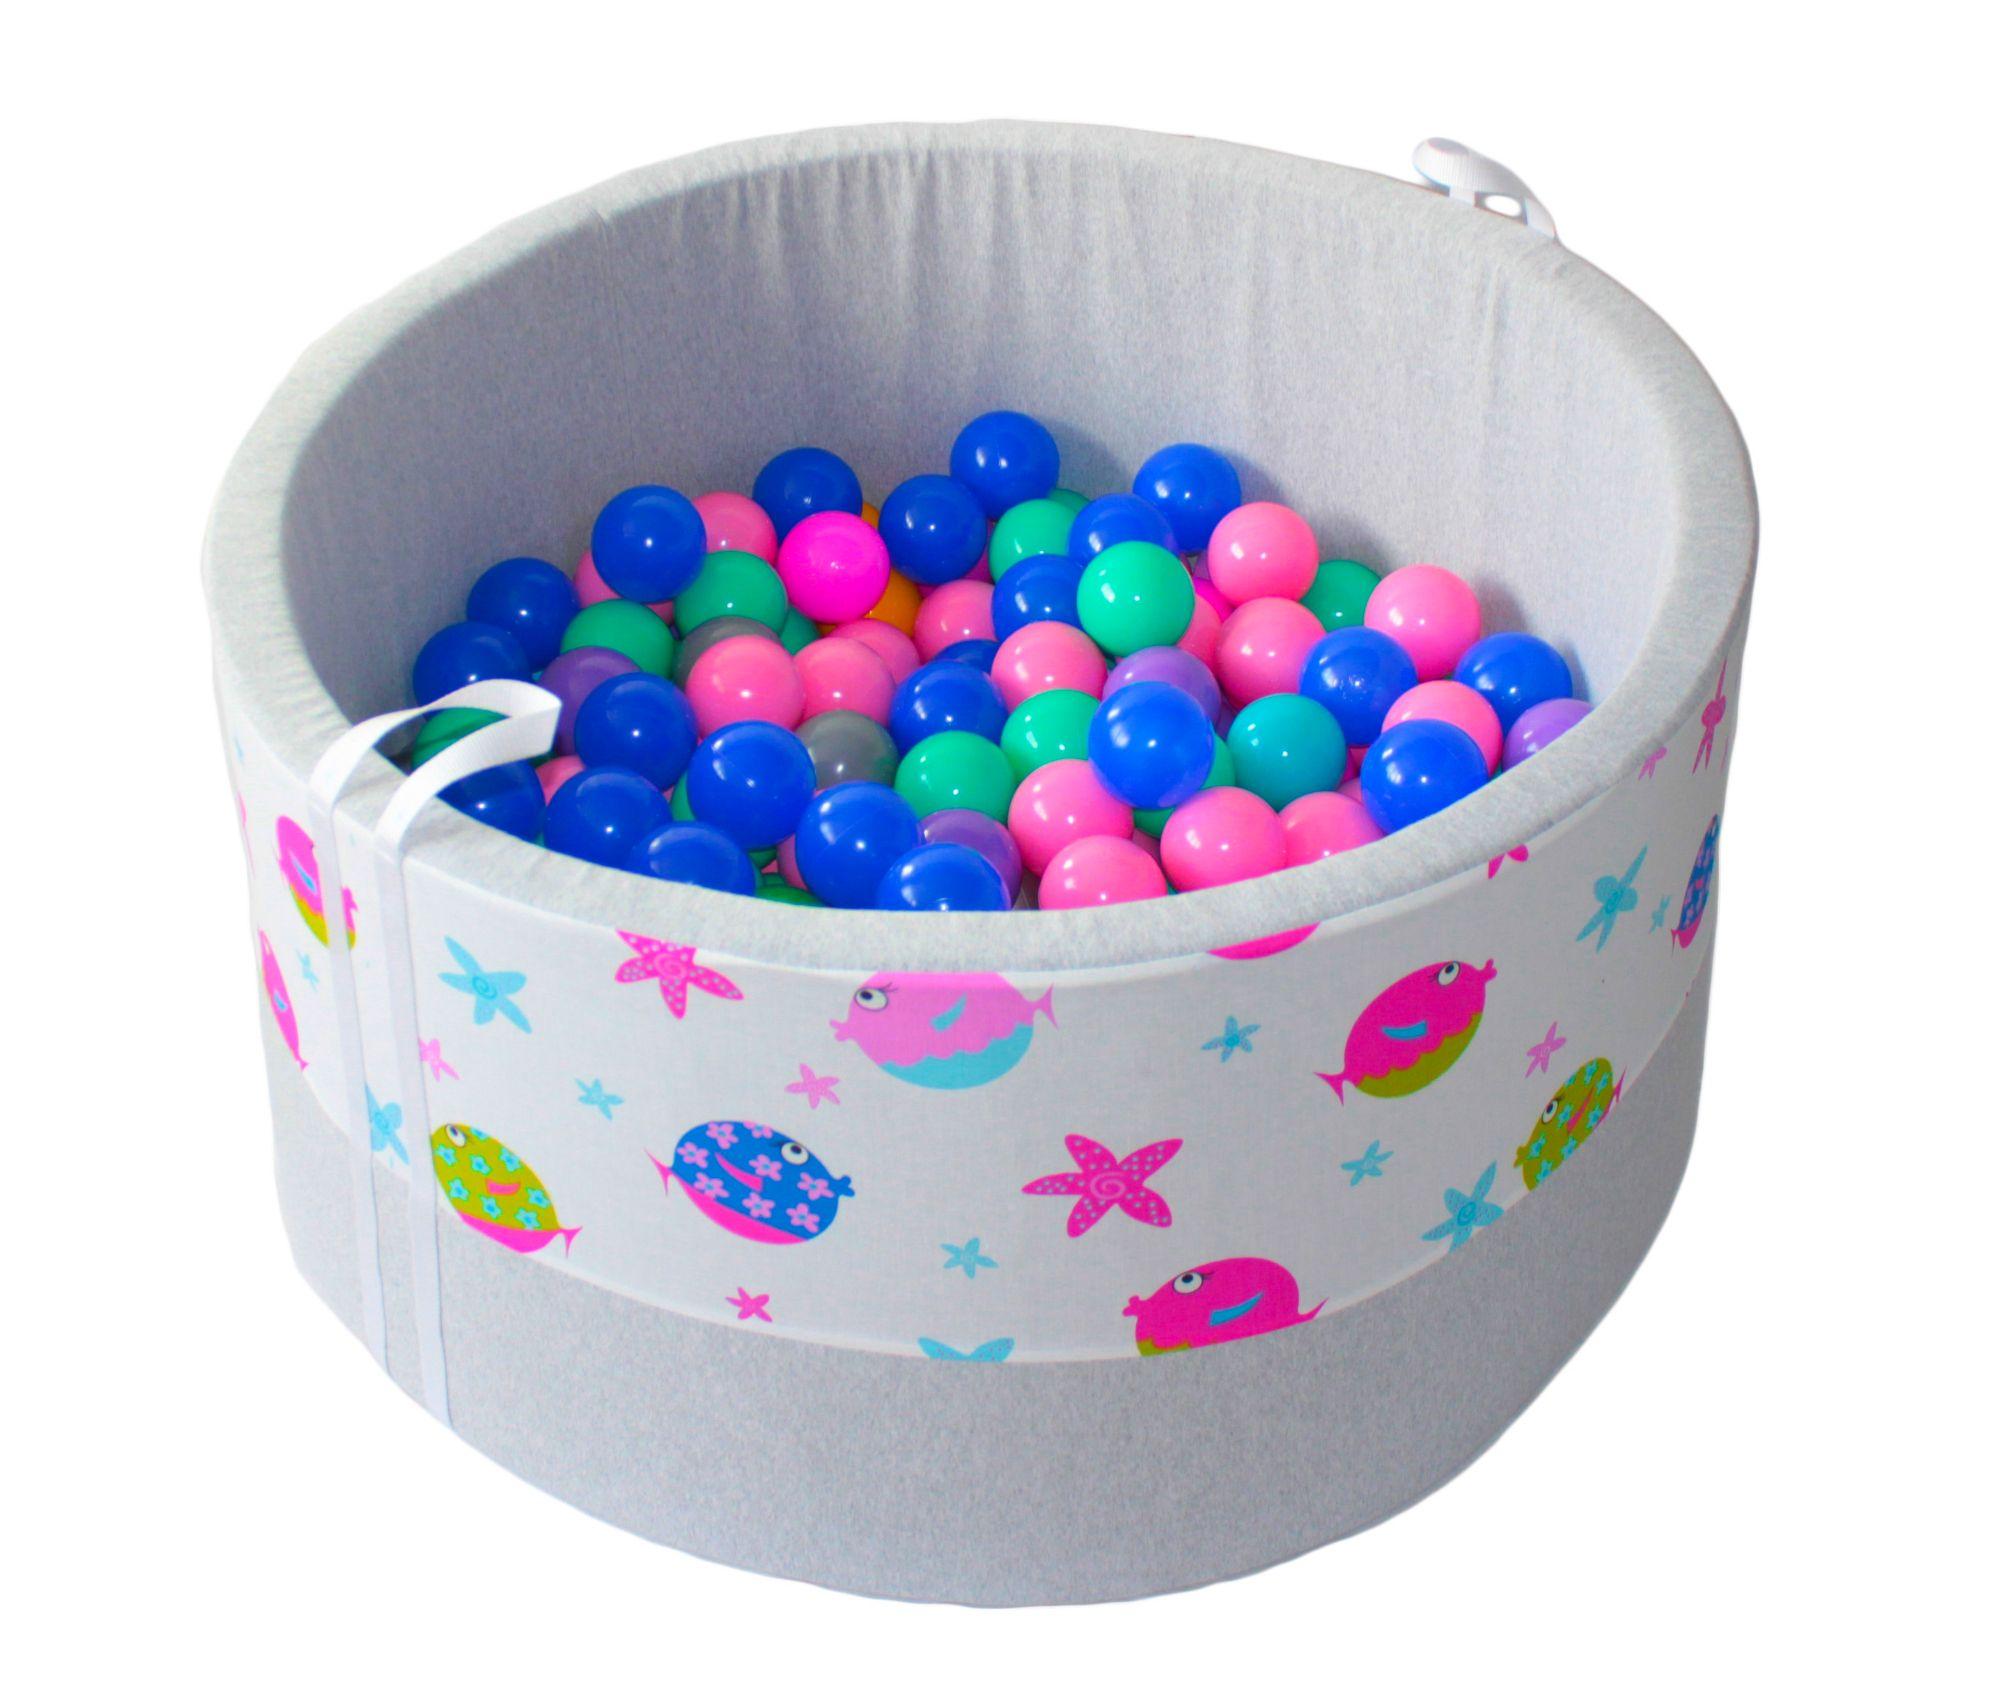 Suchy Basen Z Pileczkami Www Babyball Pl Baby Ball Swimming Pools Ball